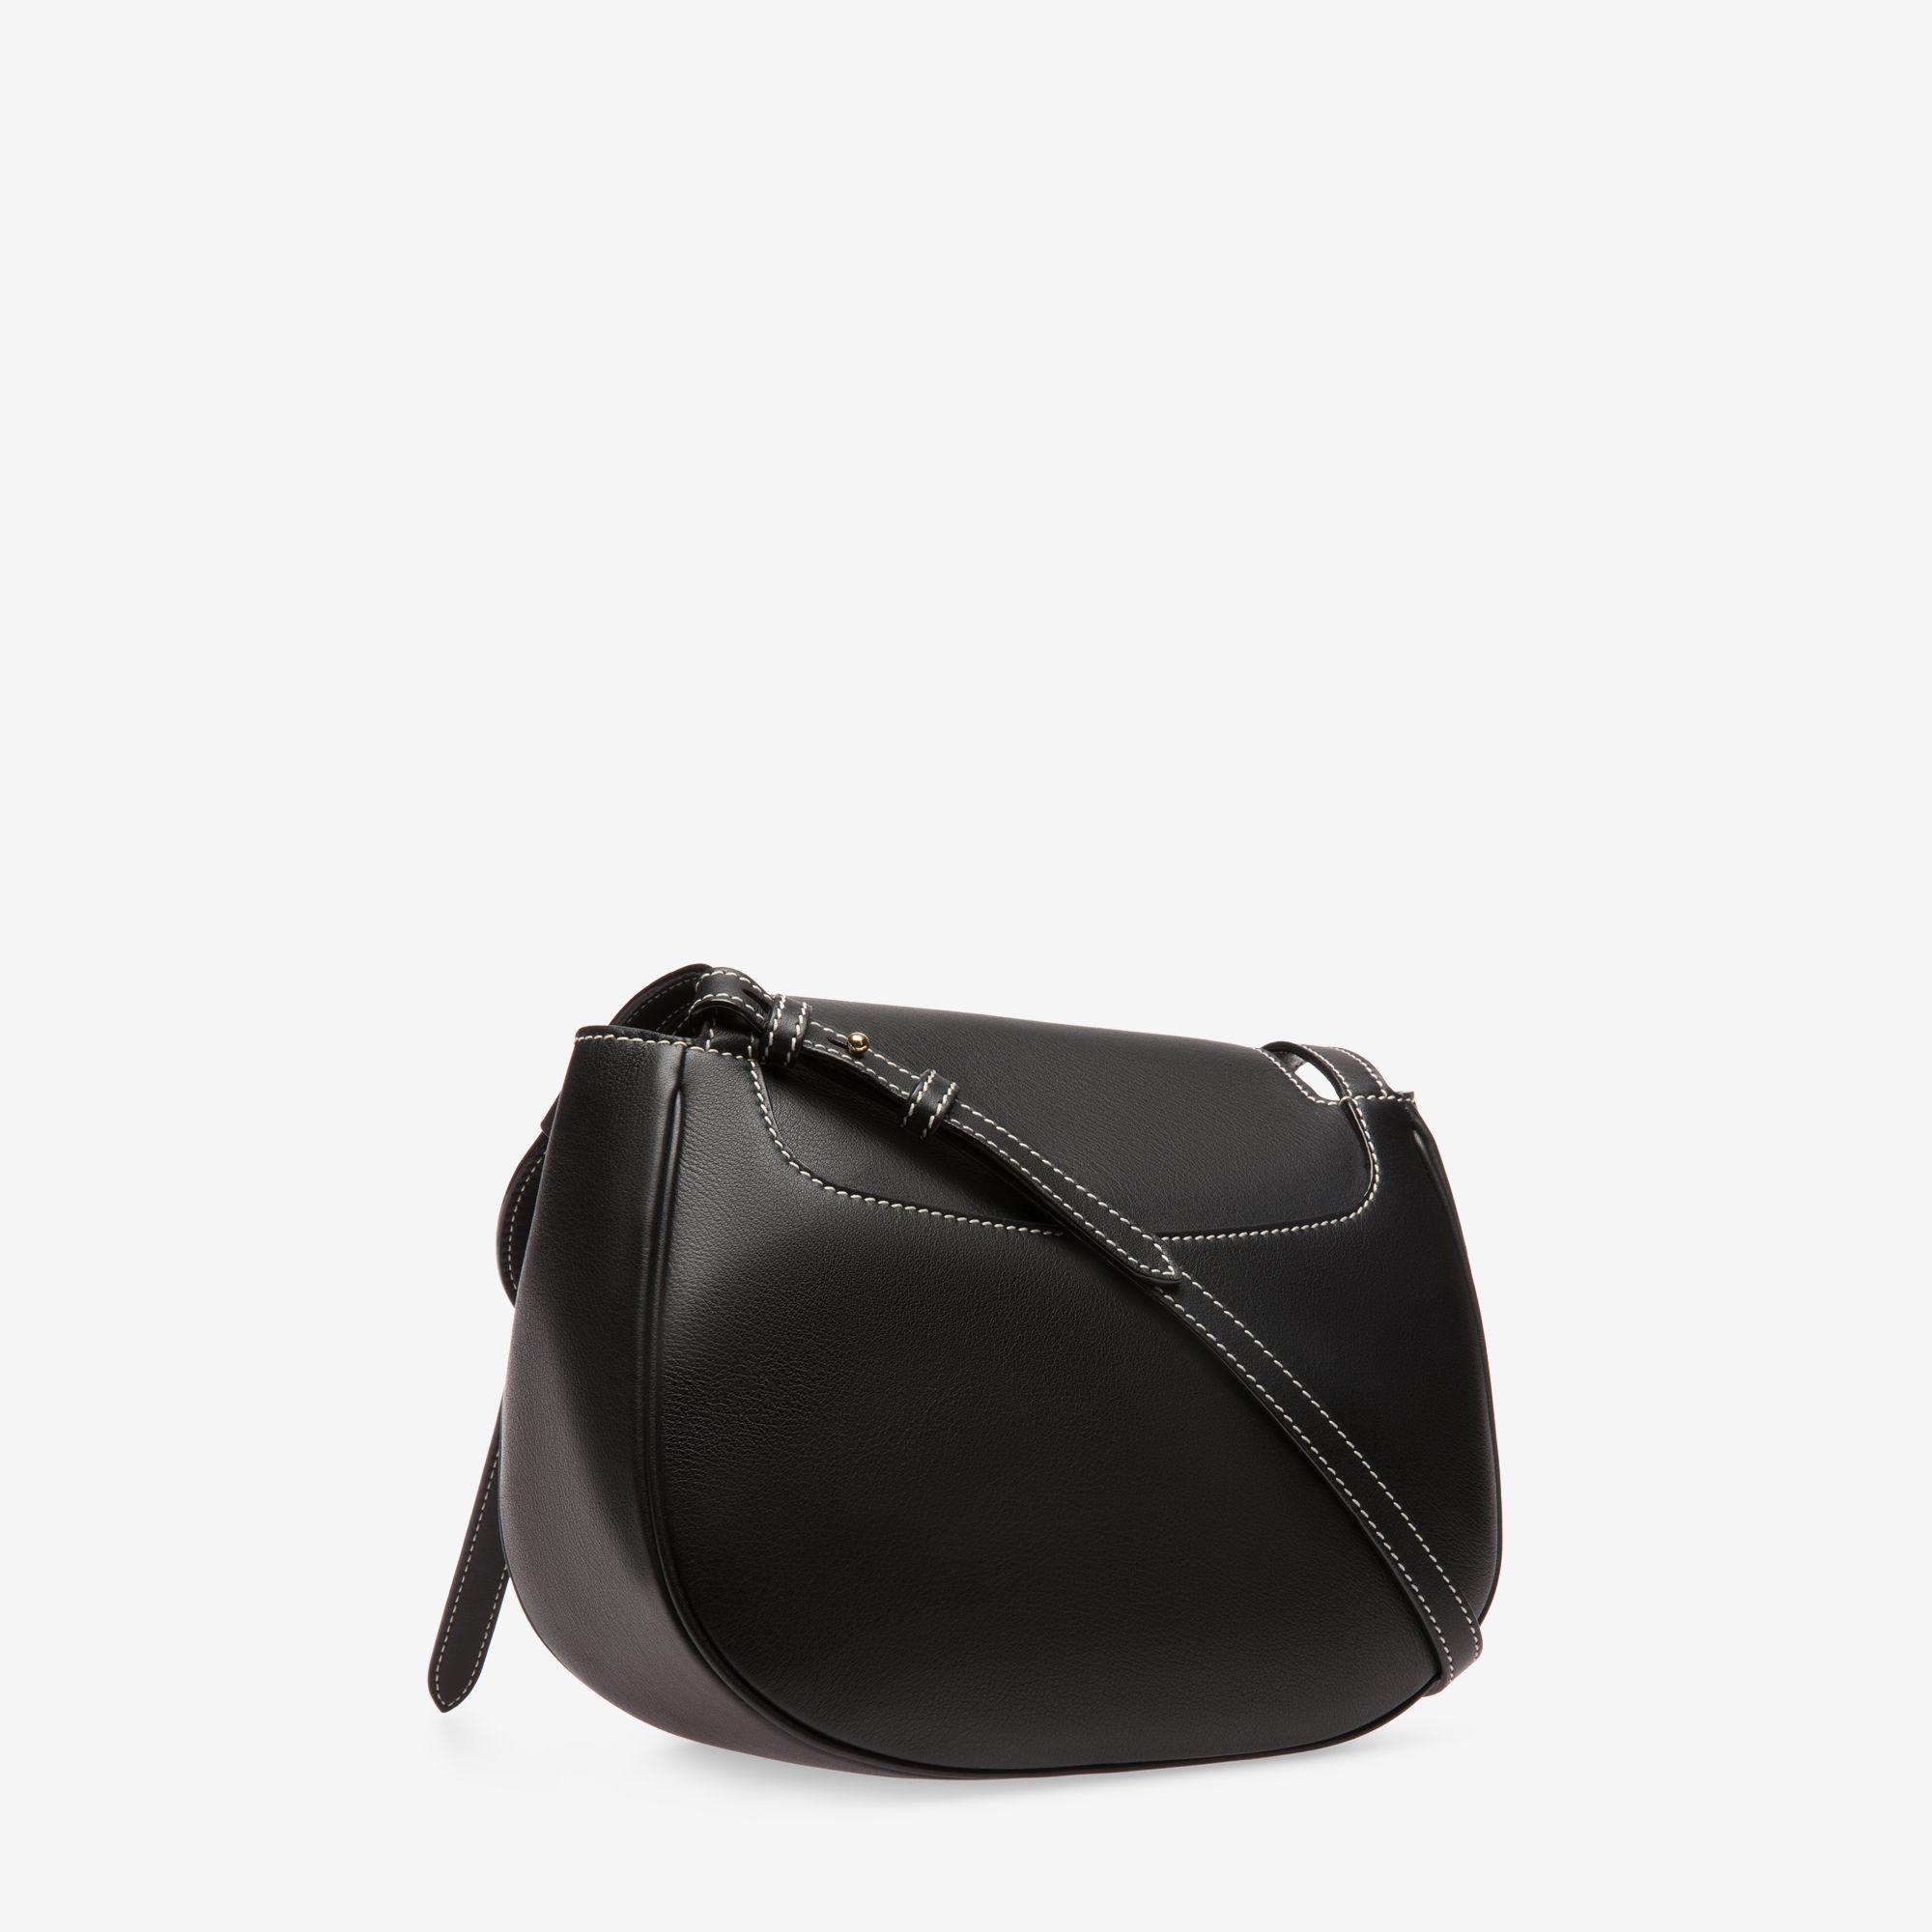 Bally - Black B Turn Saddle Bag Large - Lyst. View fullscreen e7d850fcd5